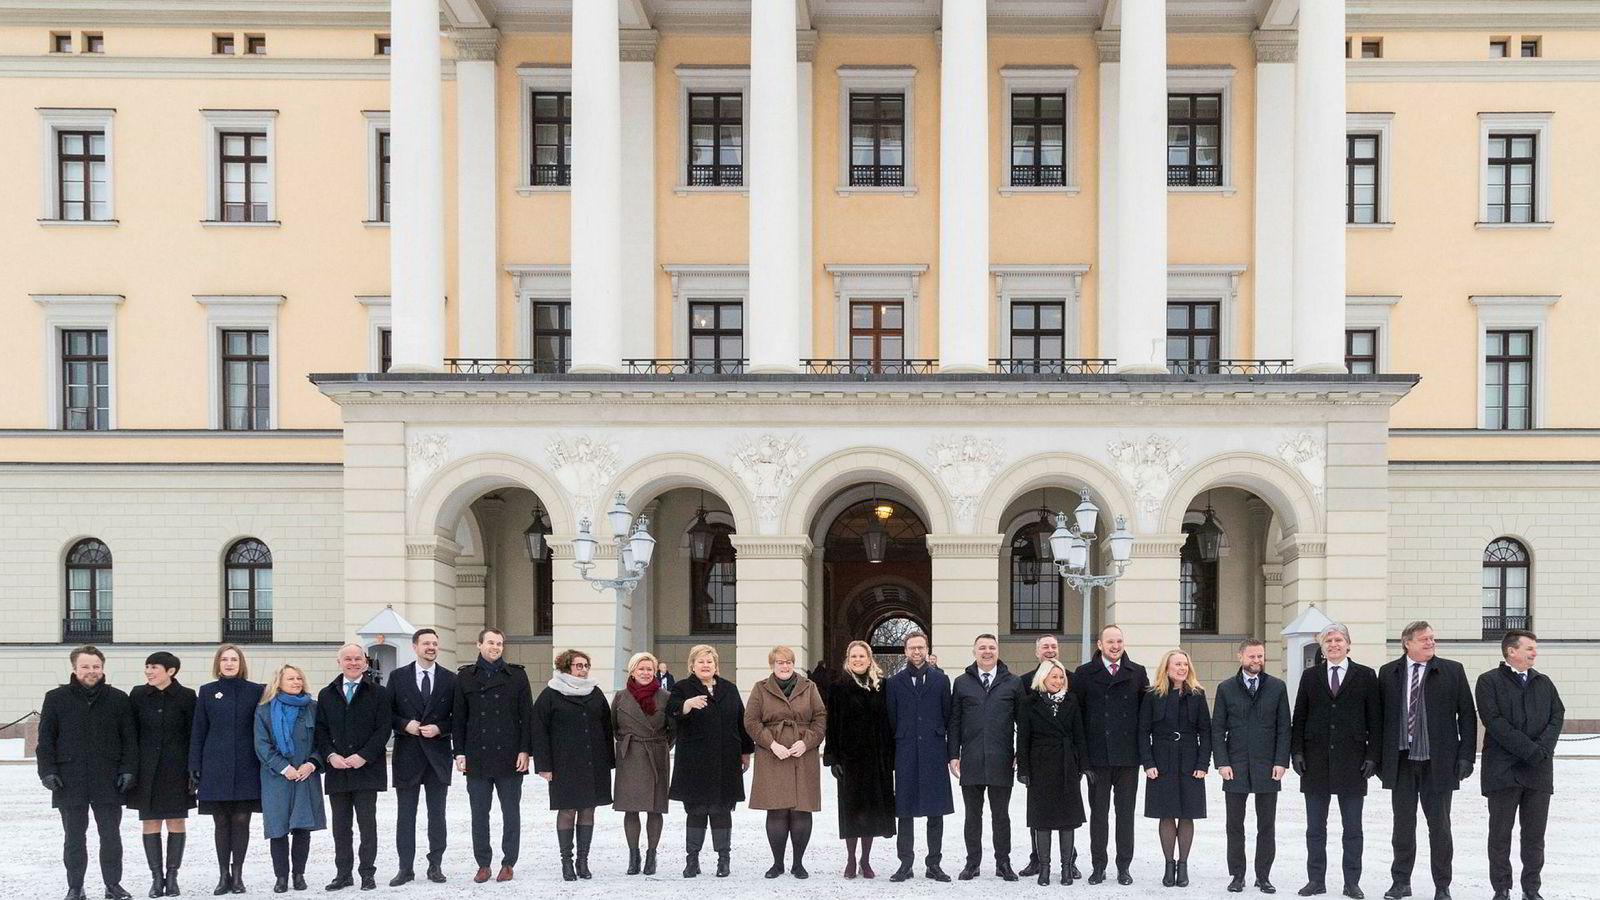 Statsministerens kontor ber statsråder droppe kollektivtransport.